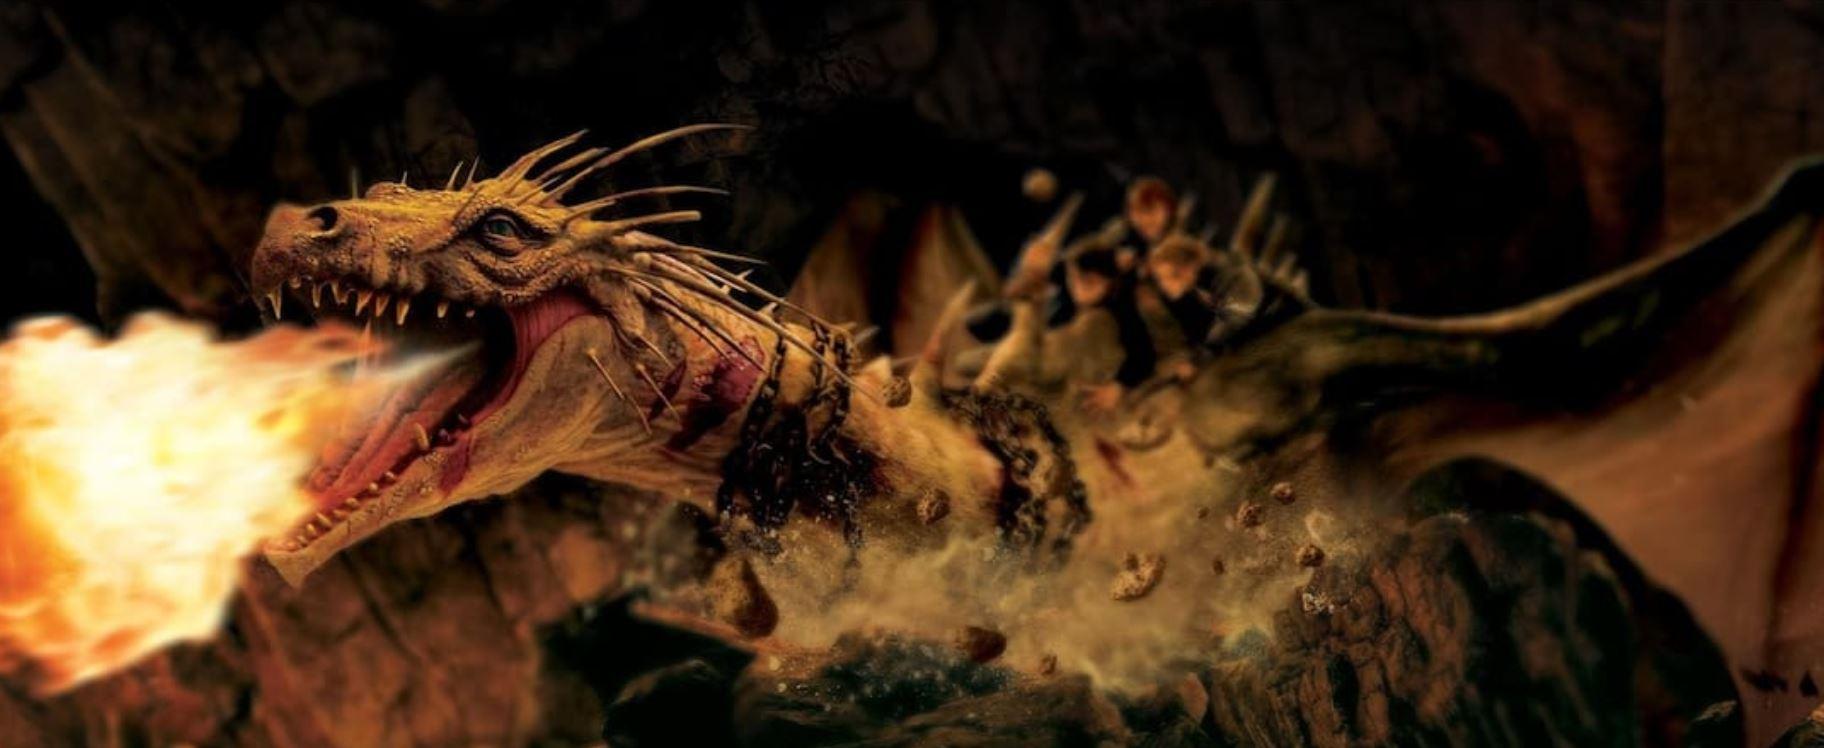 Harry Potter: Gringotts original ride story was scrapped